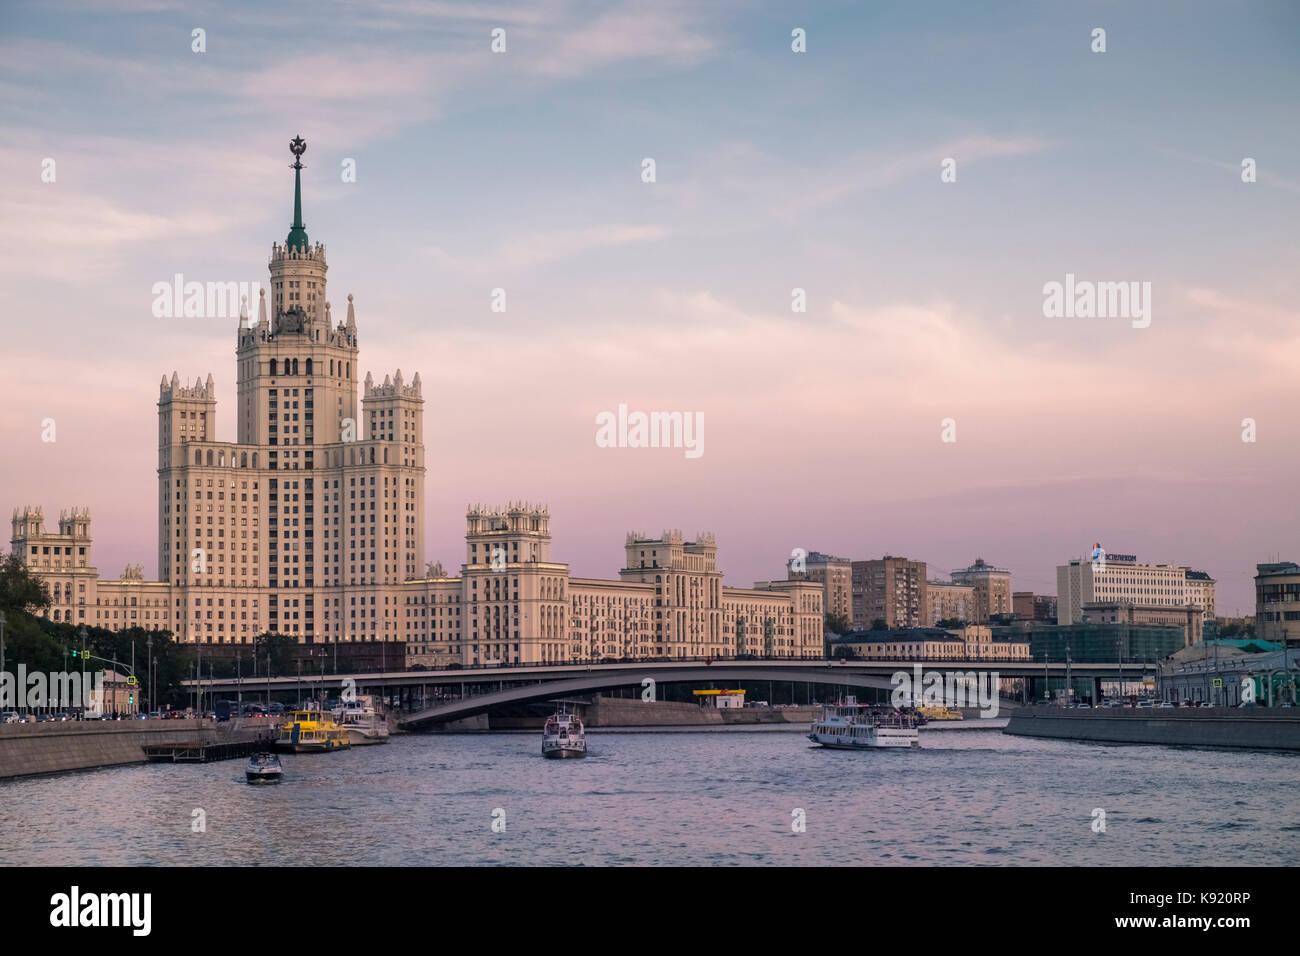 View of the Kotelnicheskaya Embankment Building, a landmark skyscraper from the Stalinist era alongside the Moskva - Stock Image